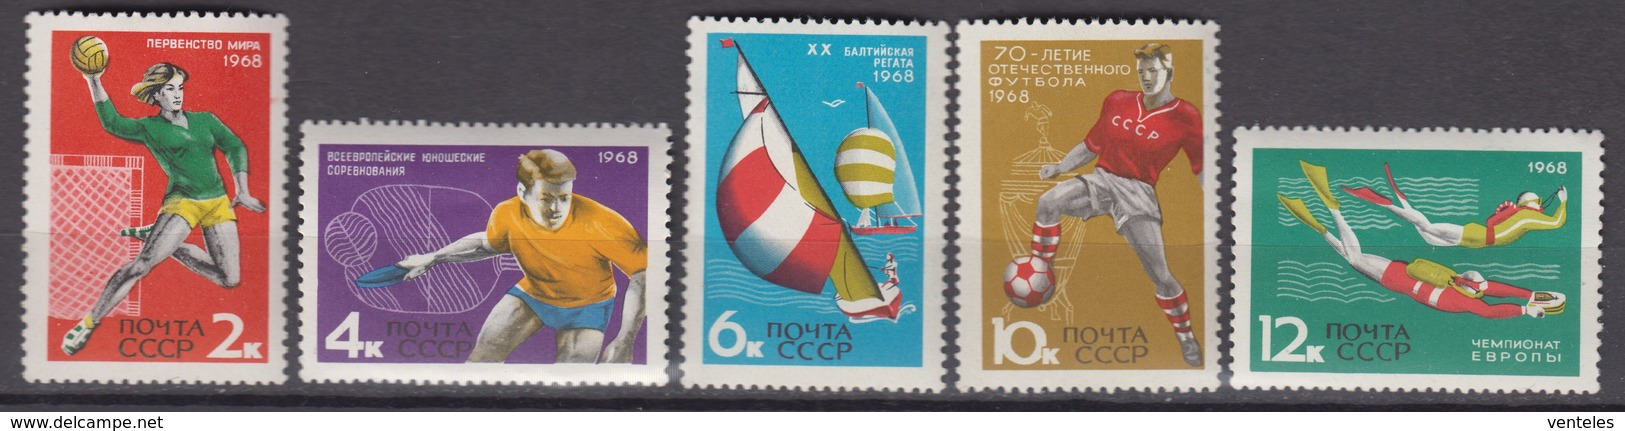 Russia, USSR 18.07.1968Mi # 3512-16; International Sports Competitions MNH OG - Nuevos